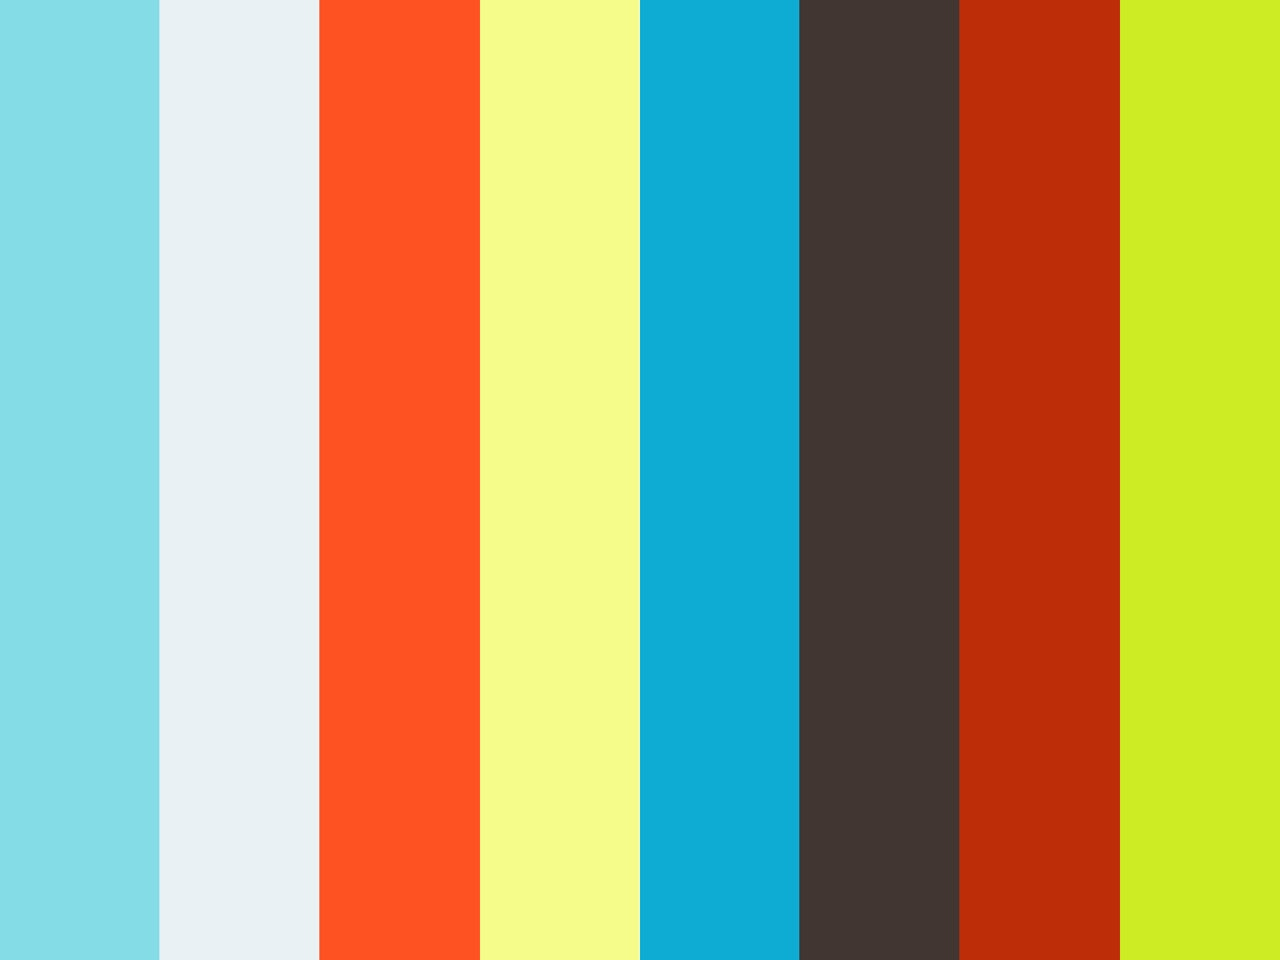 Webstock '10: Amy Hoy - Shift+Cmd+R: Hard Refresh Your Design